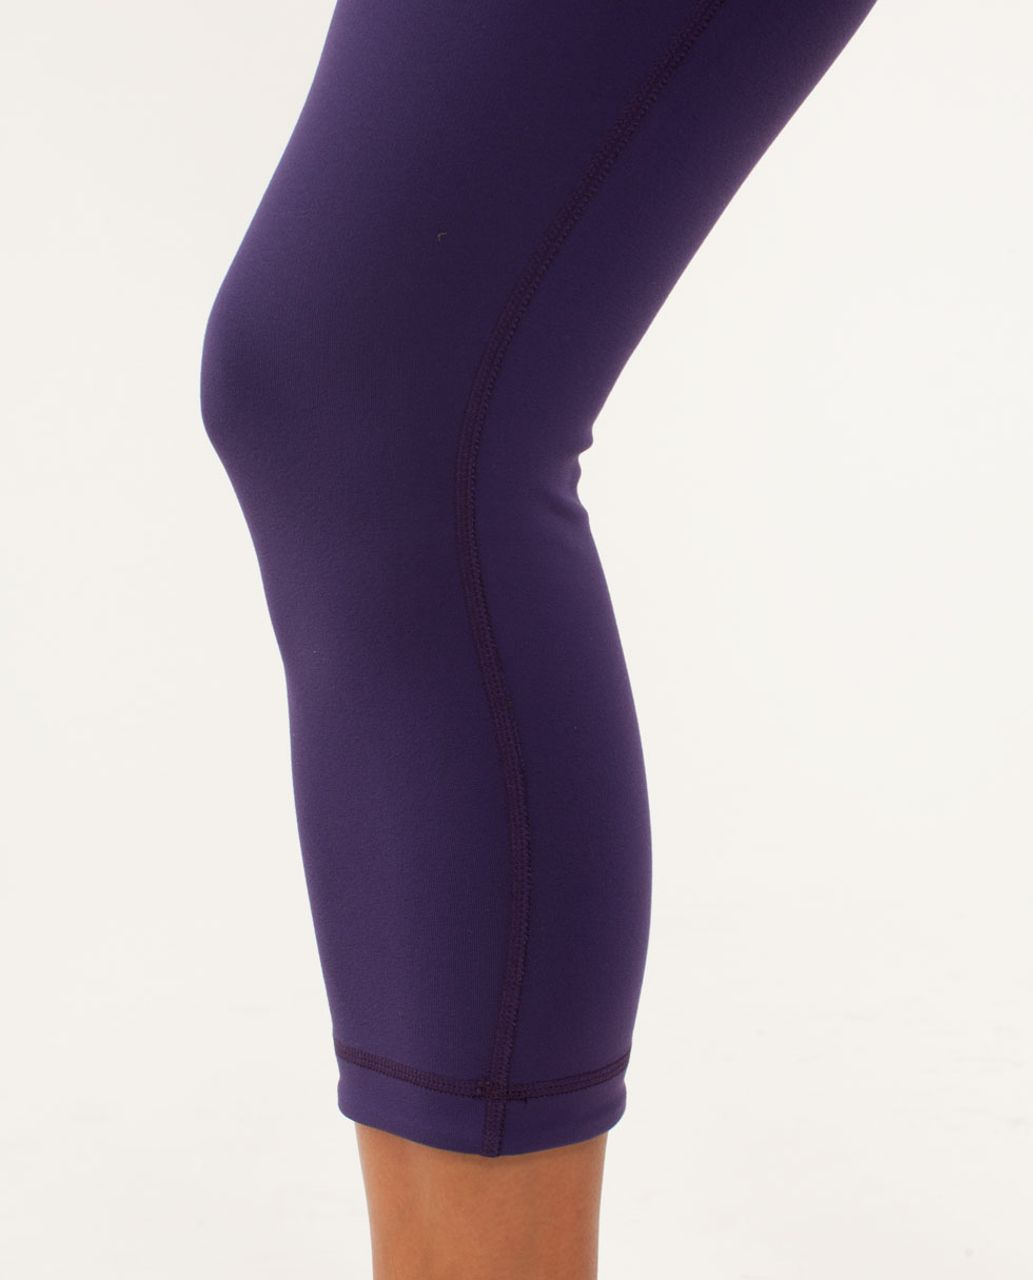 Lululemon Wunder Under Crop *Reversible - Dense Purple / Black